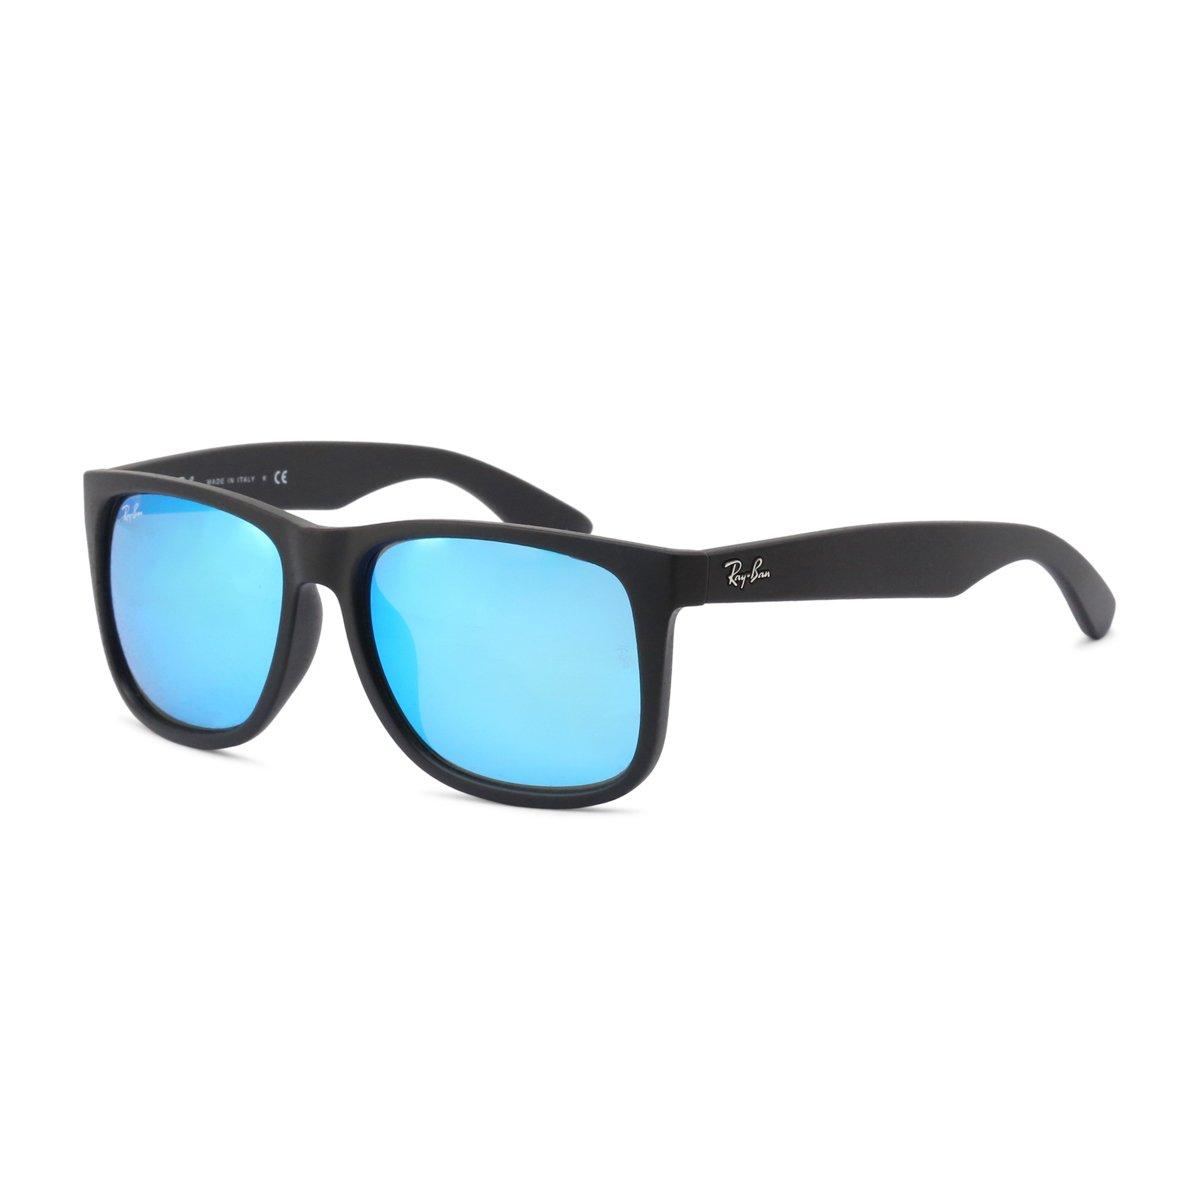 Ray-Ban Unisex Sunglasses Black 0RB4165F - black-3 NOSIZE